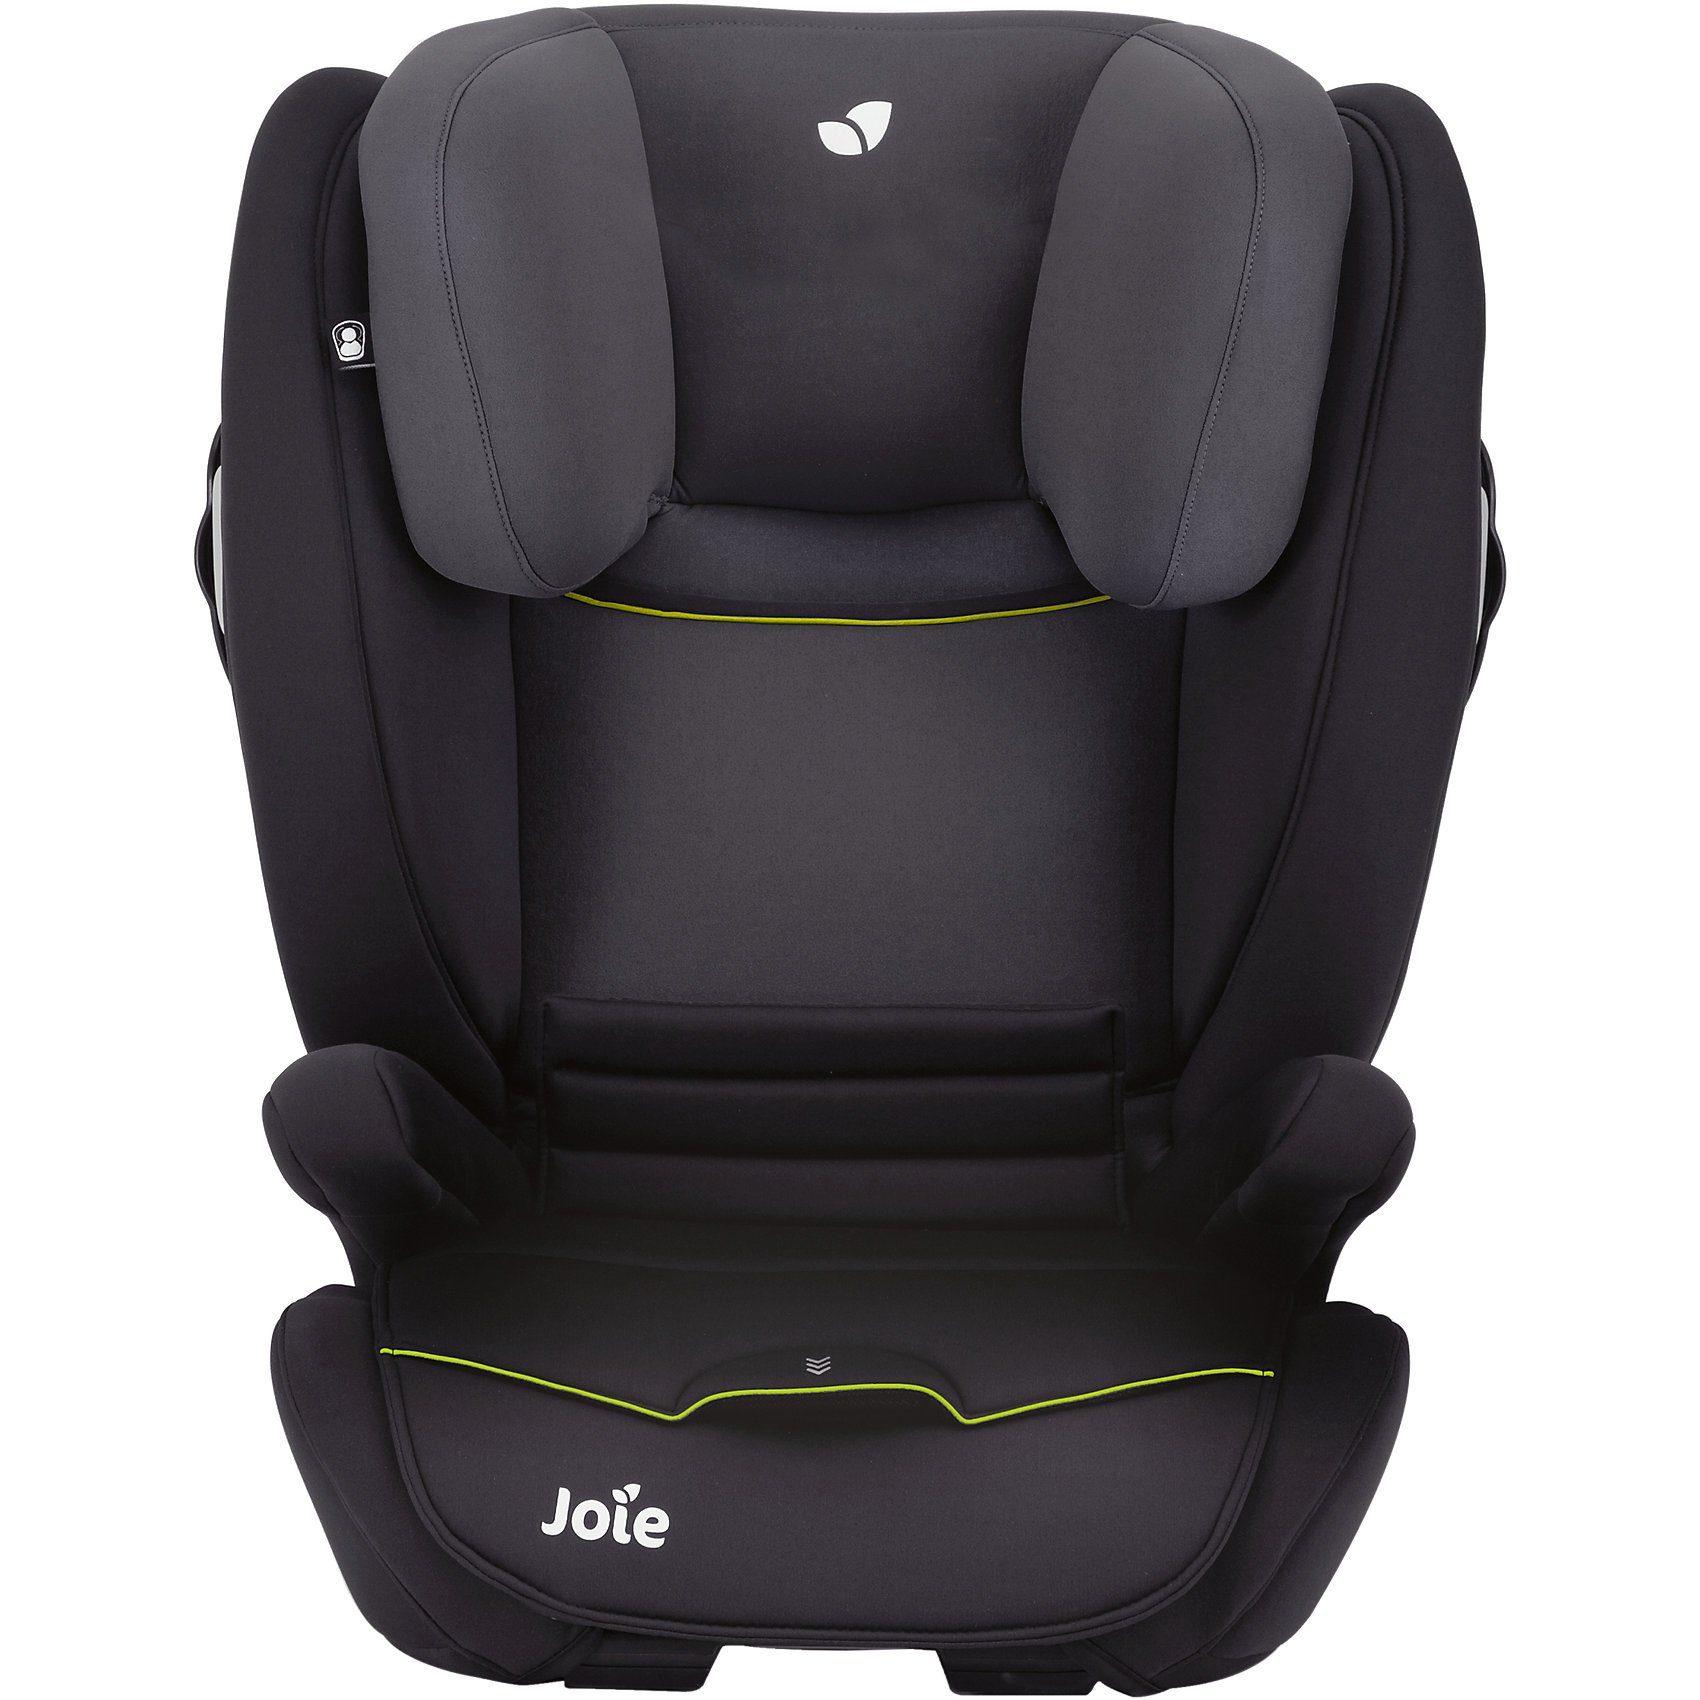 Joie Auto-Kindersitz Duallo, Urban